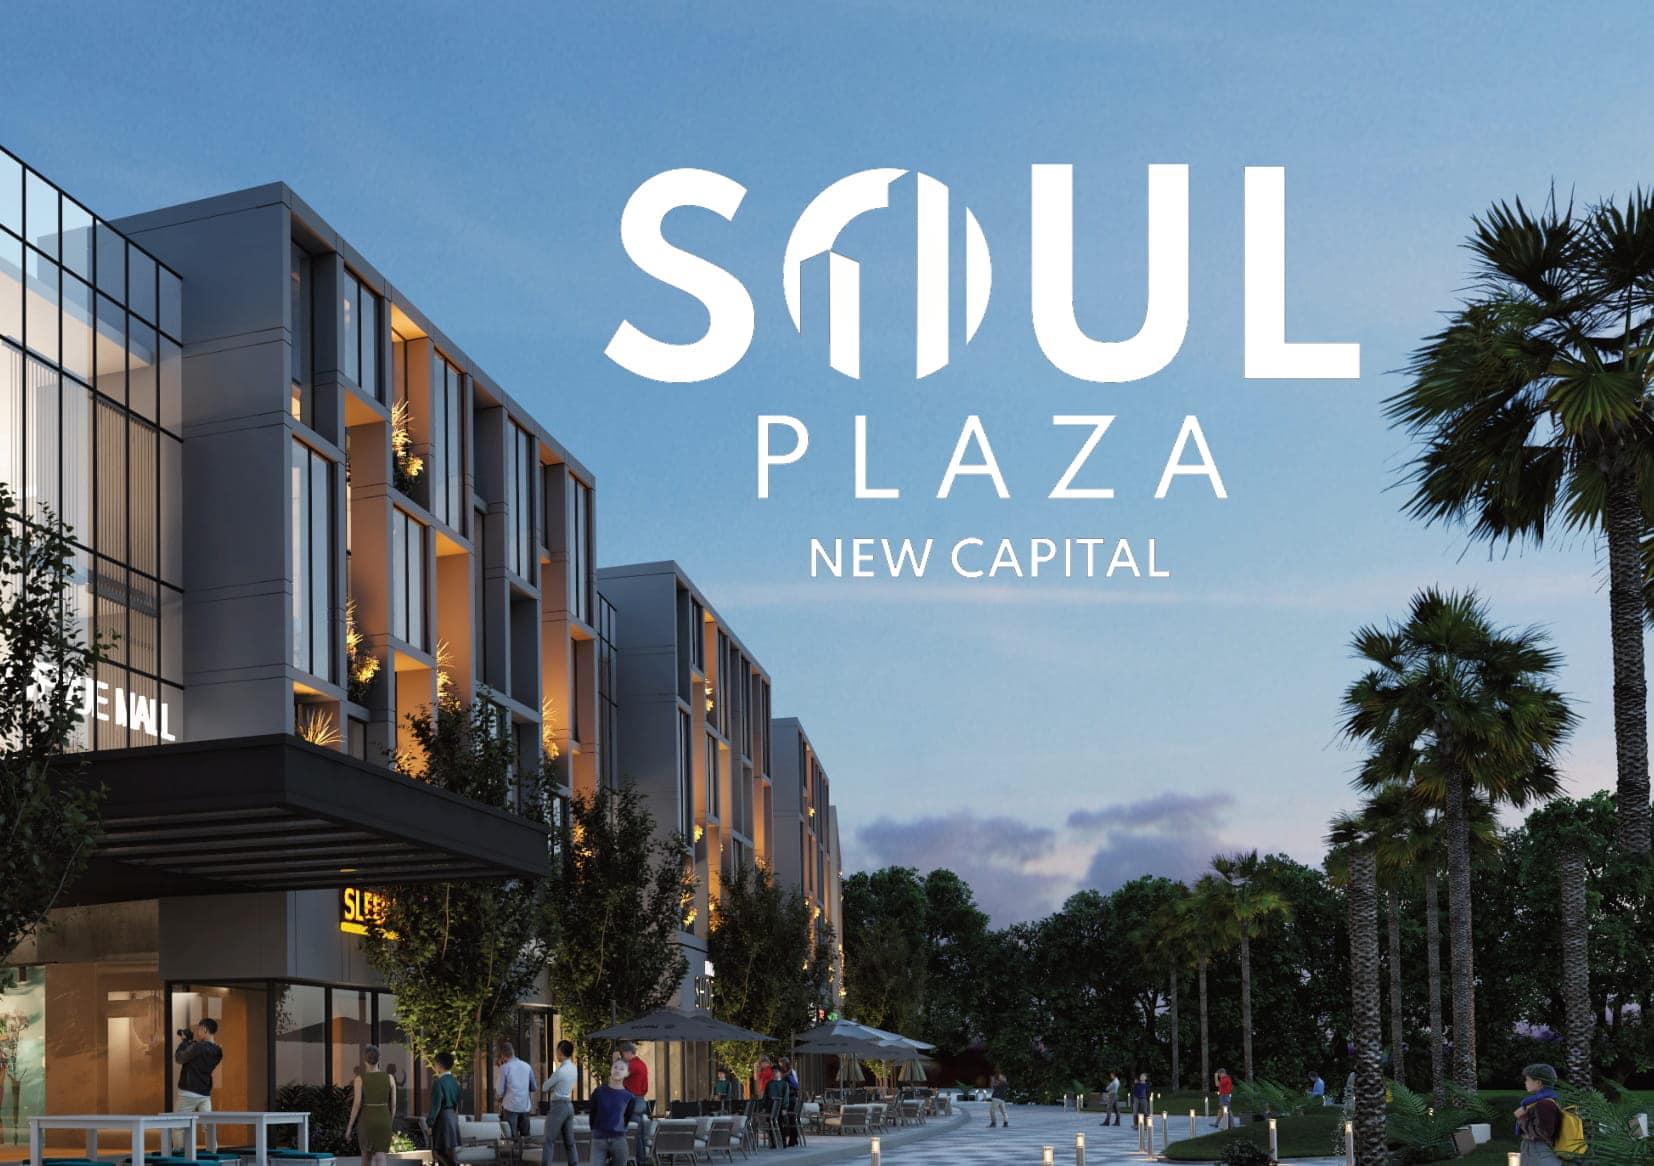 soul plaza mall new capital